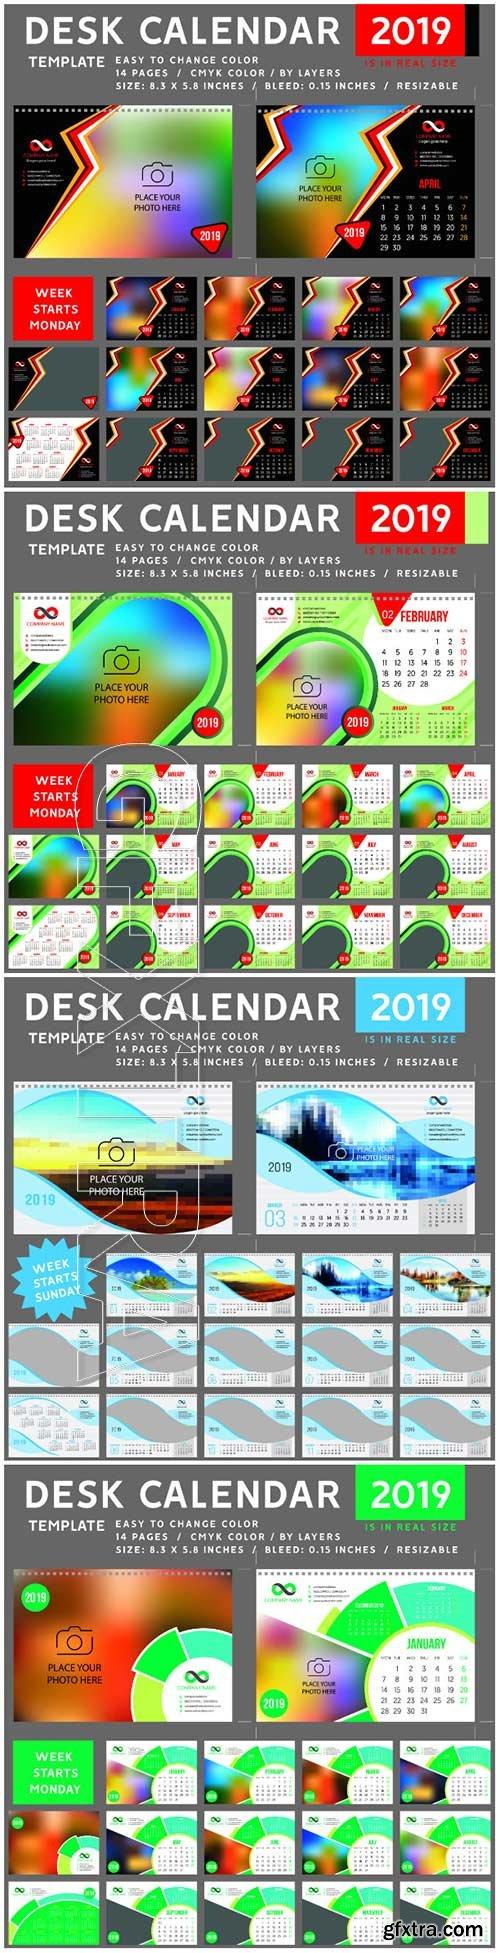 Desk Calendar 2019 vector template, 12 months included # 3